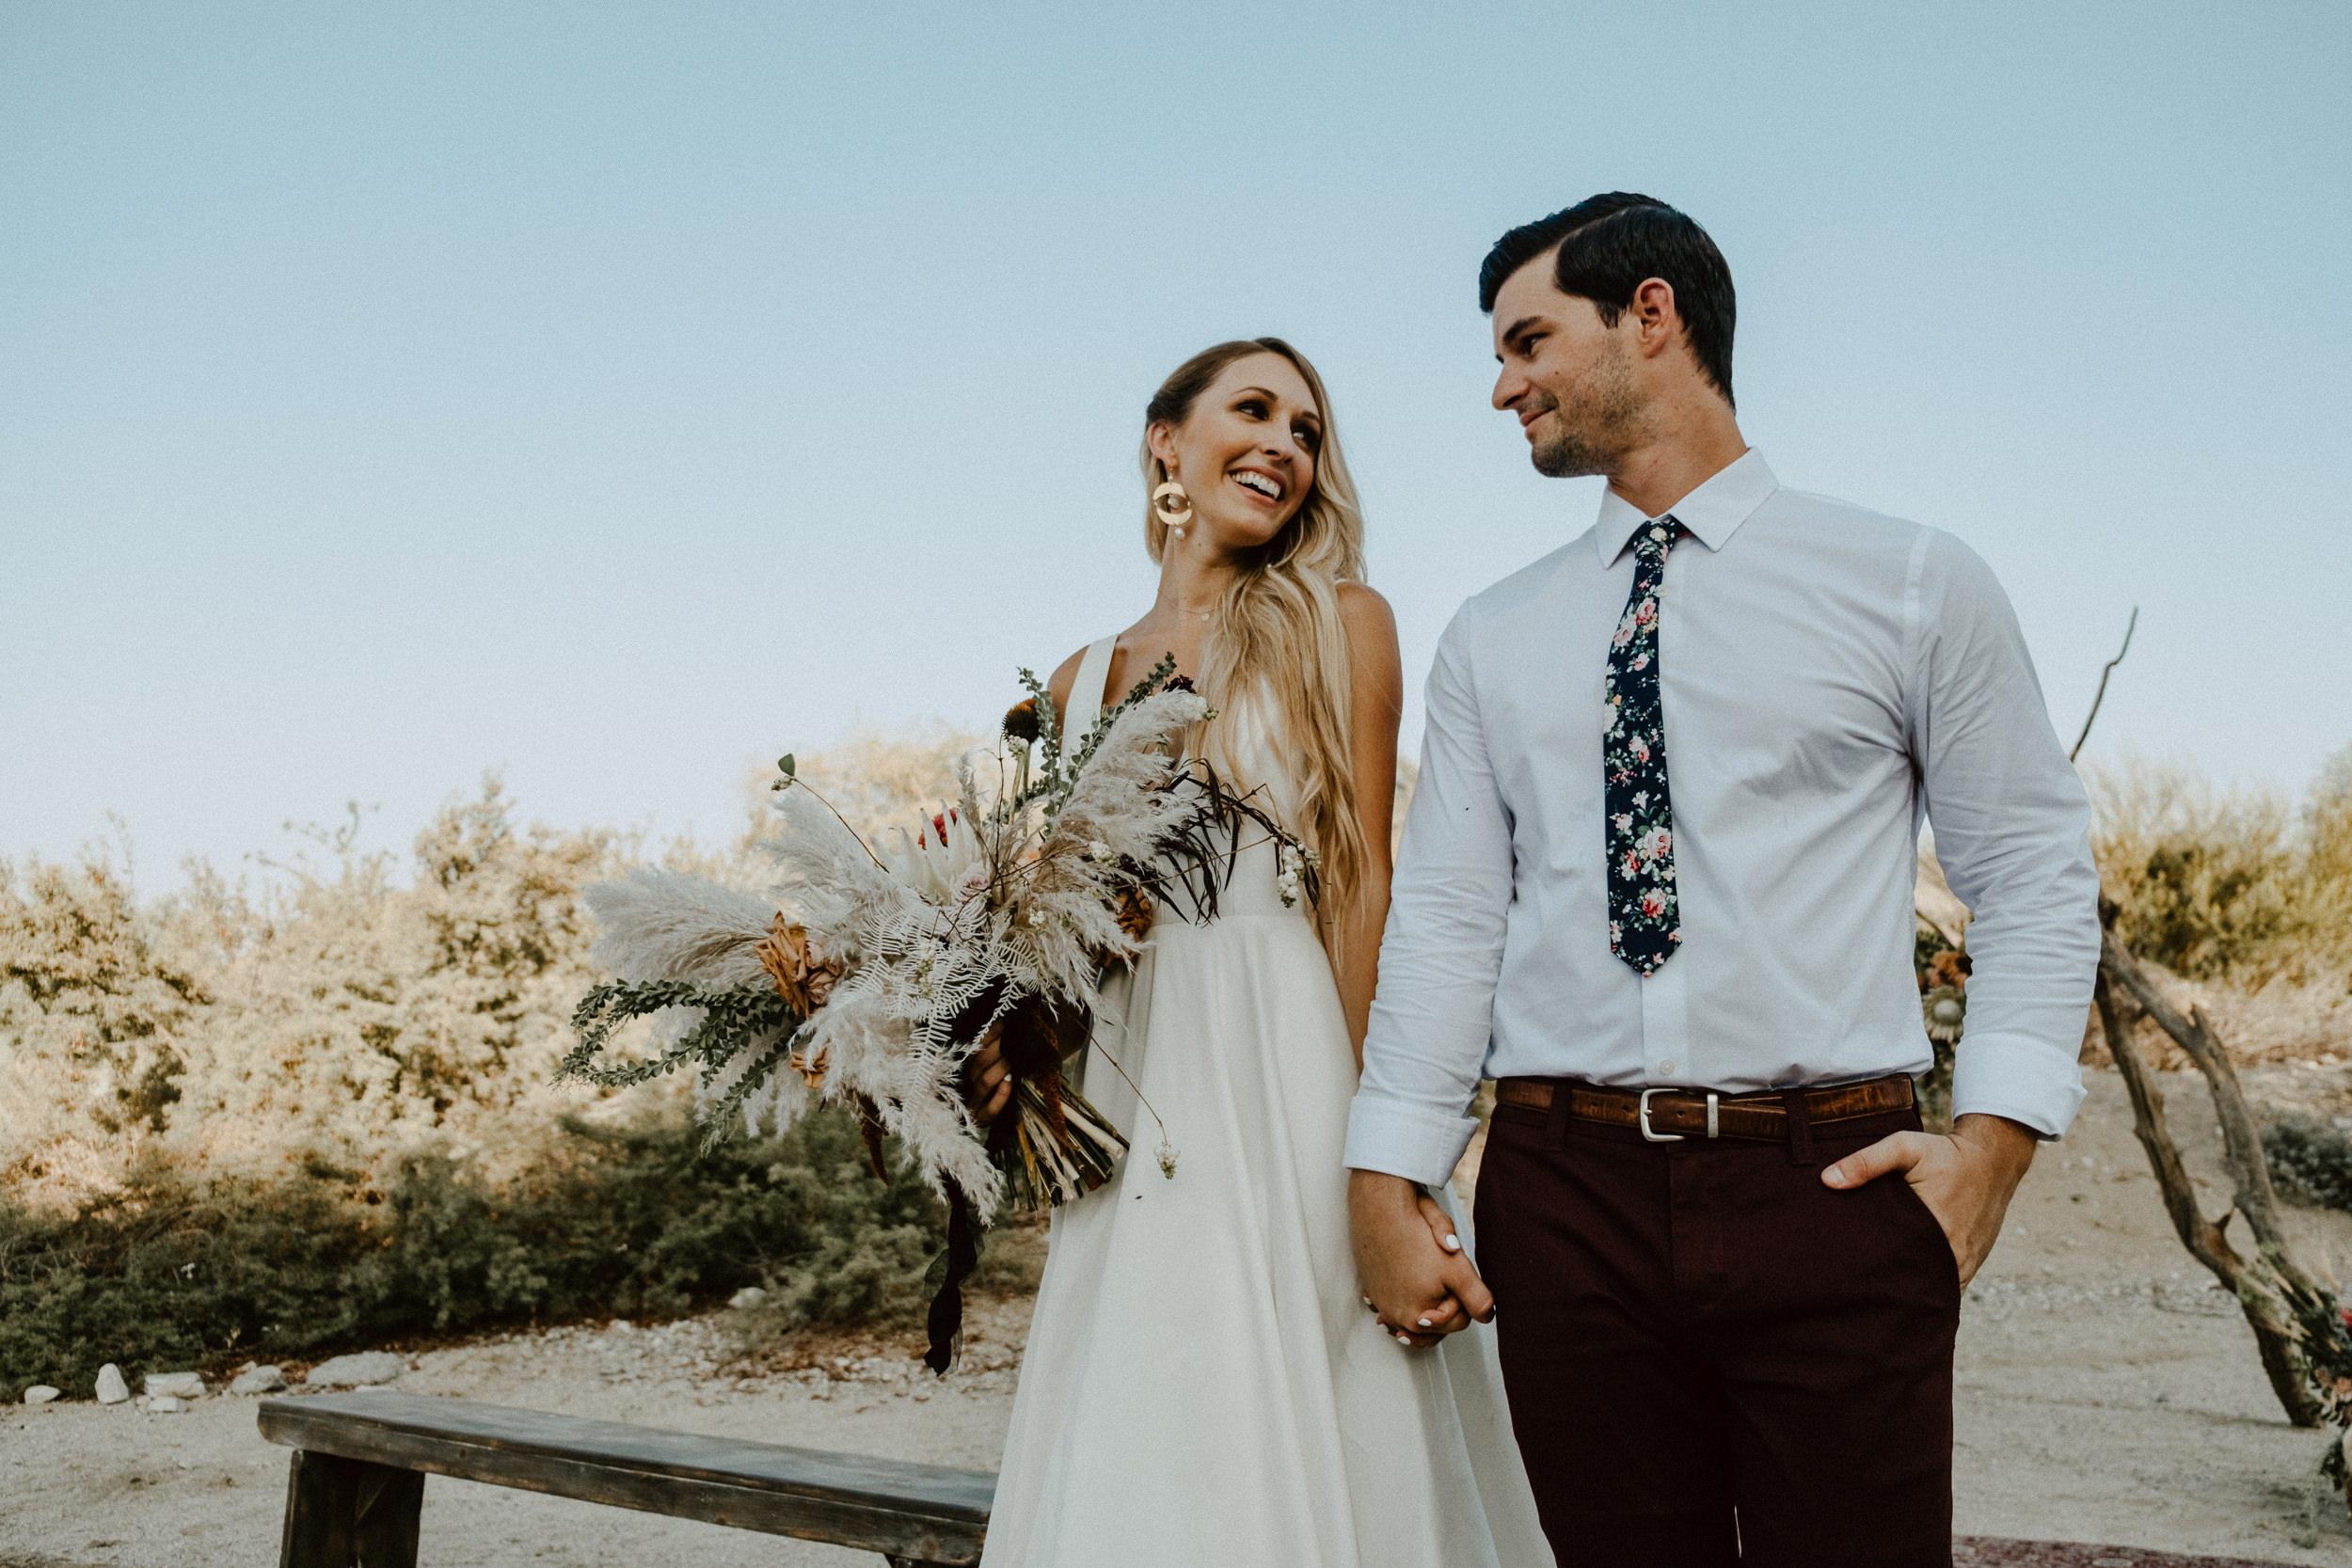 sChelsie + Chris - The Desert Shootout Wedding Romantics at The Living Desert-7.jpg